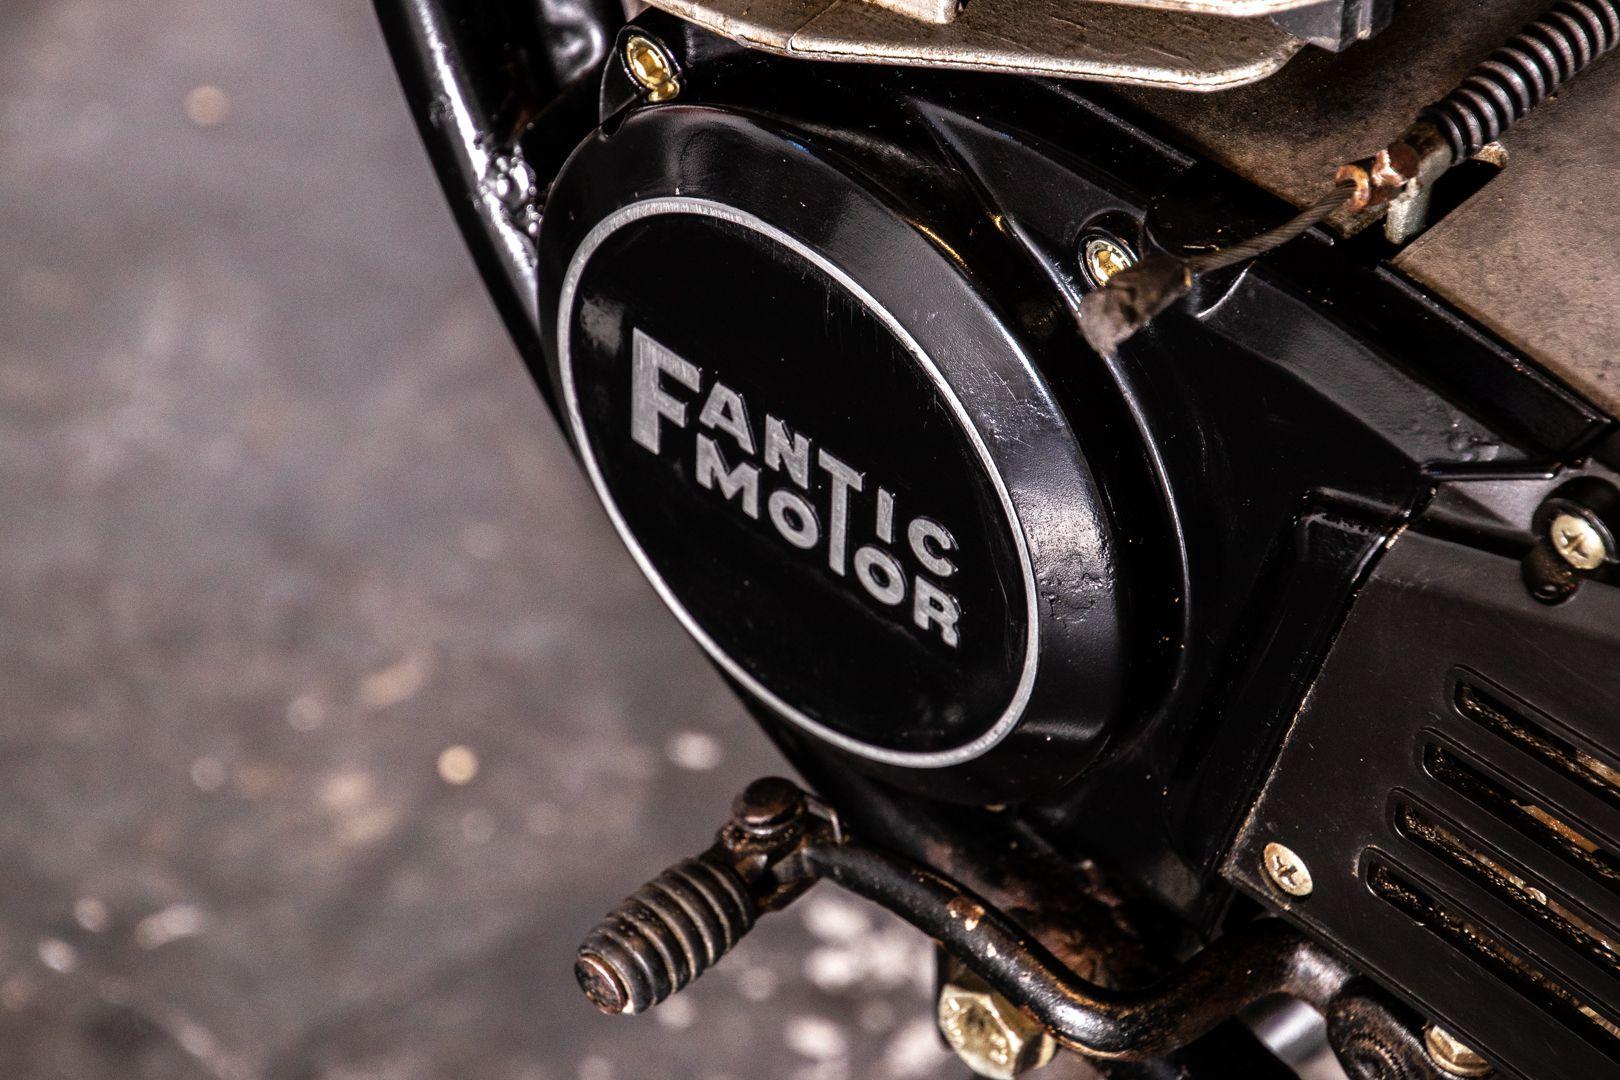 1984 Fantic Motor 402 48176